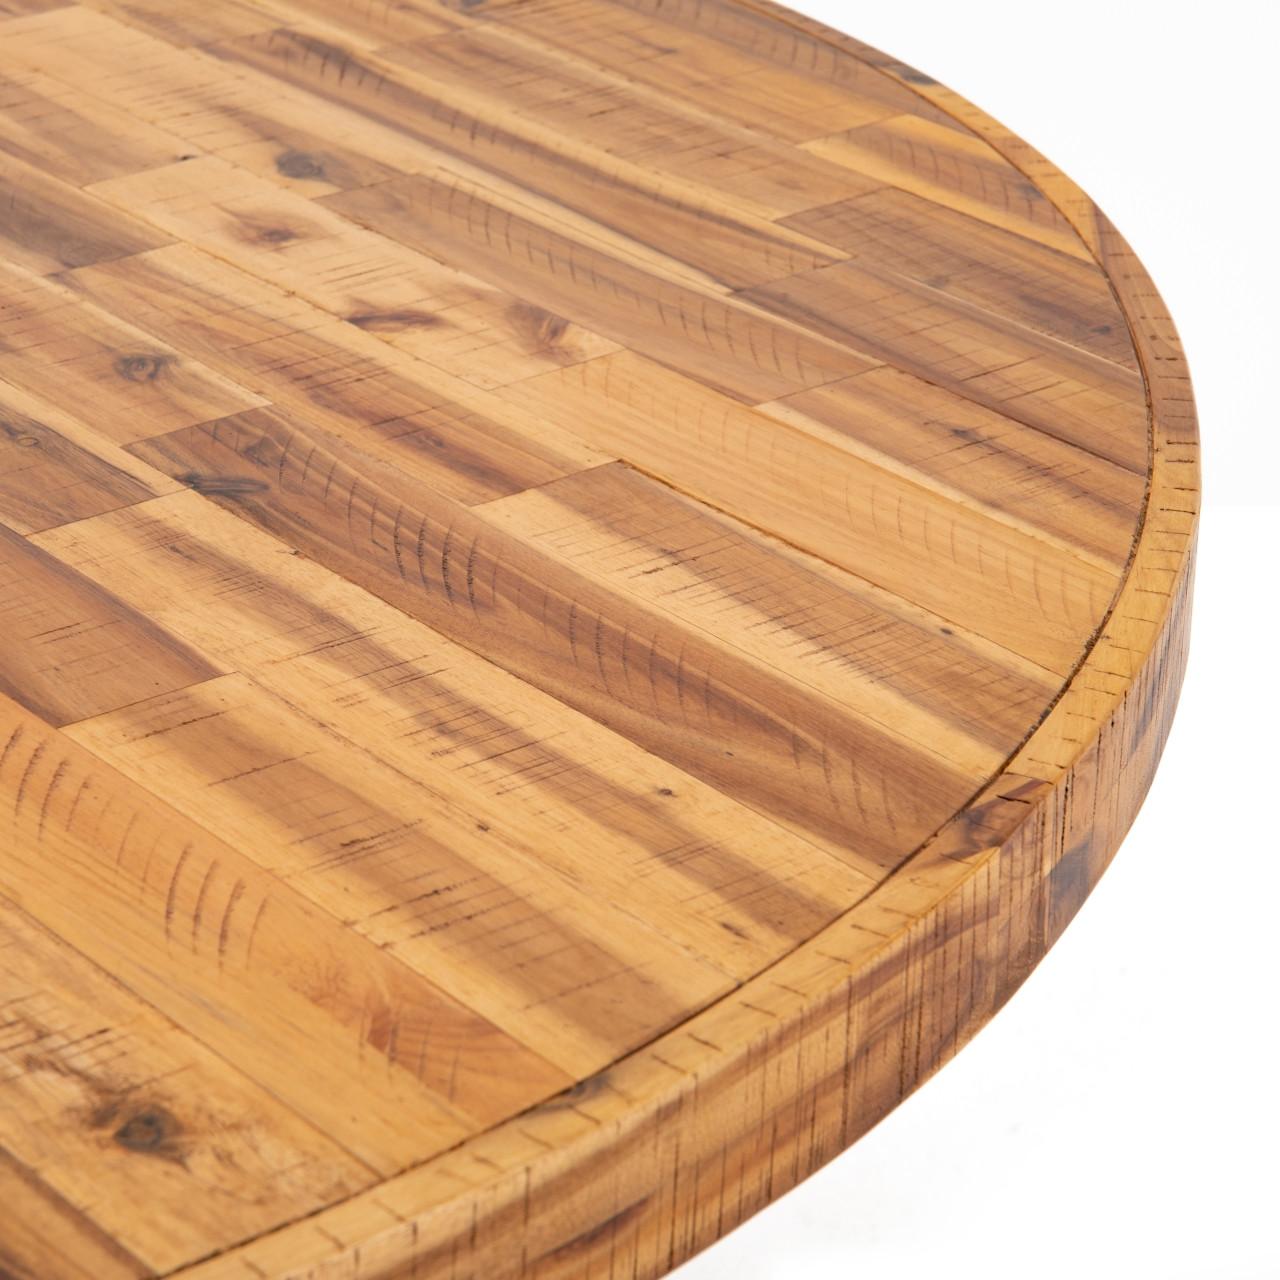 Aketia Round Dining Table - Light Honey